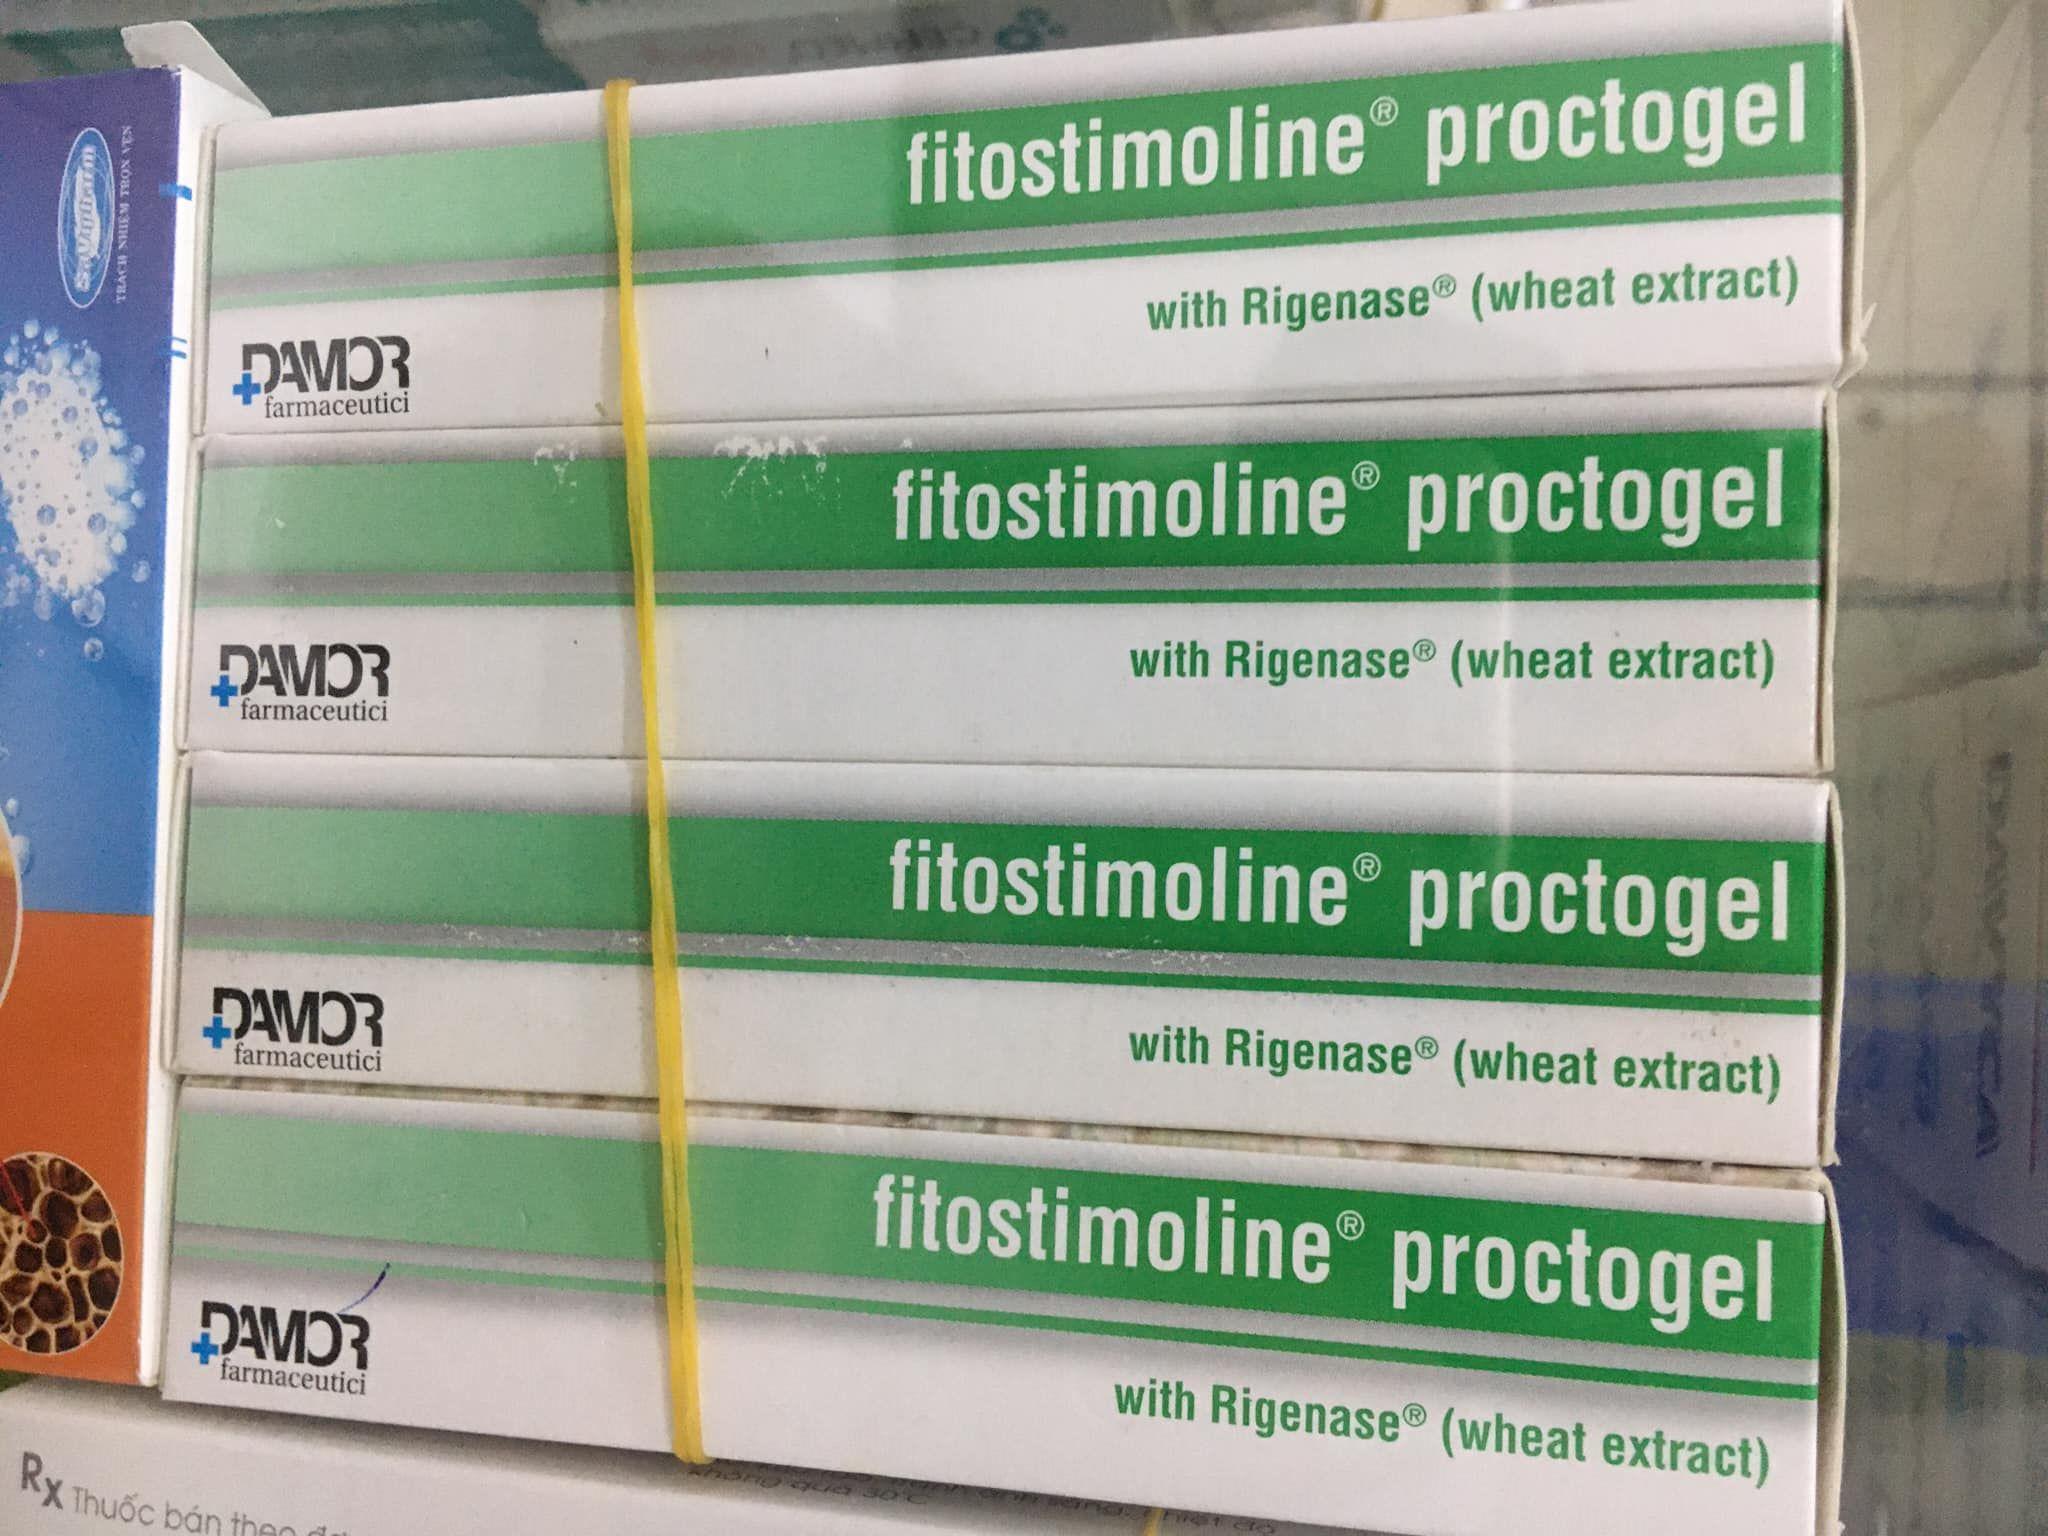 Fitostimoline Proctogel